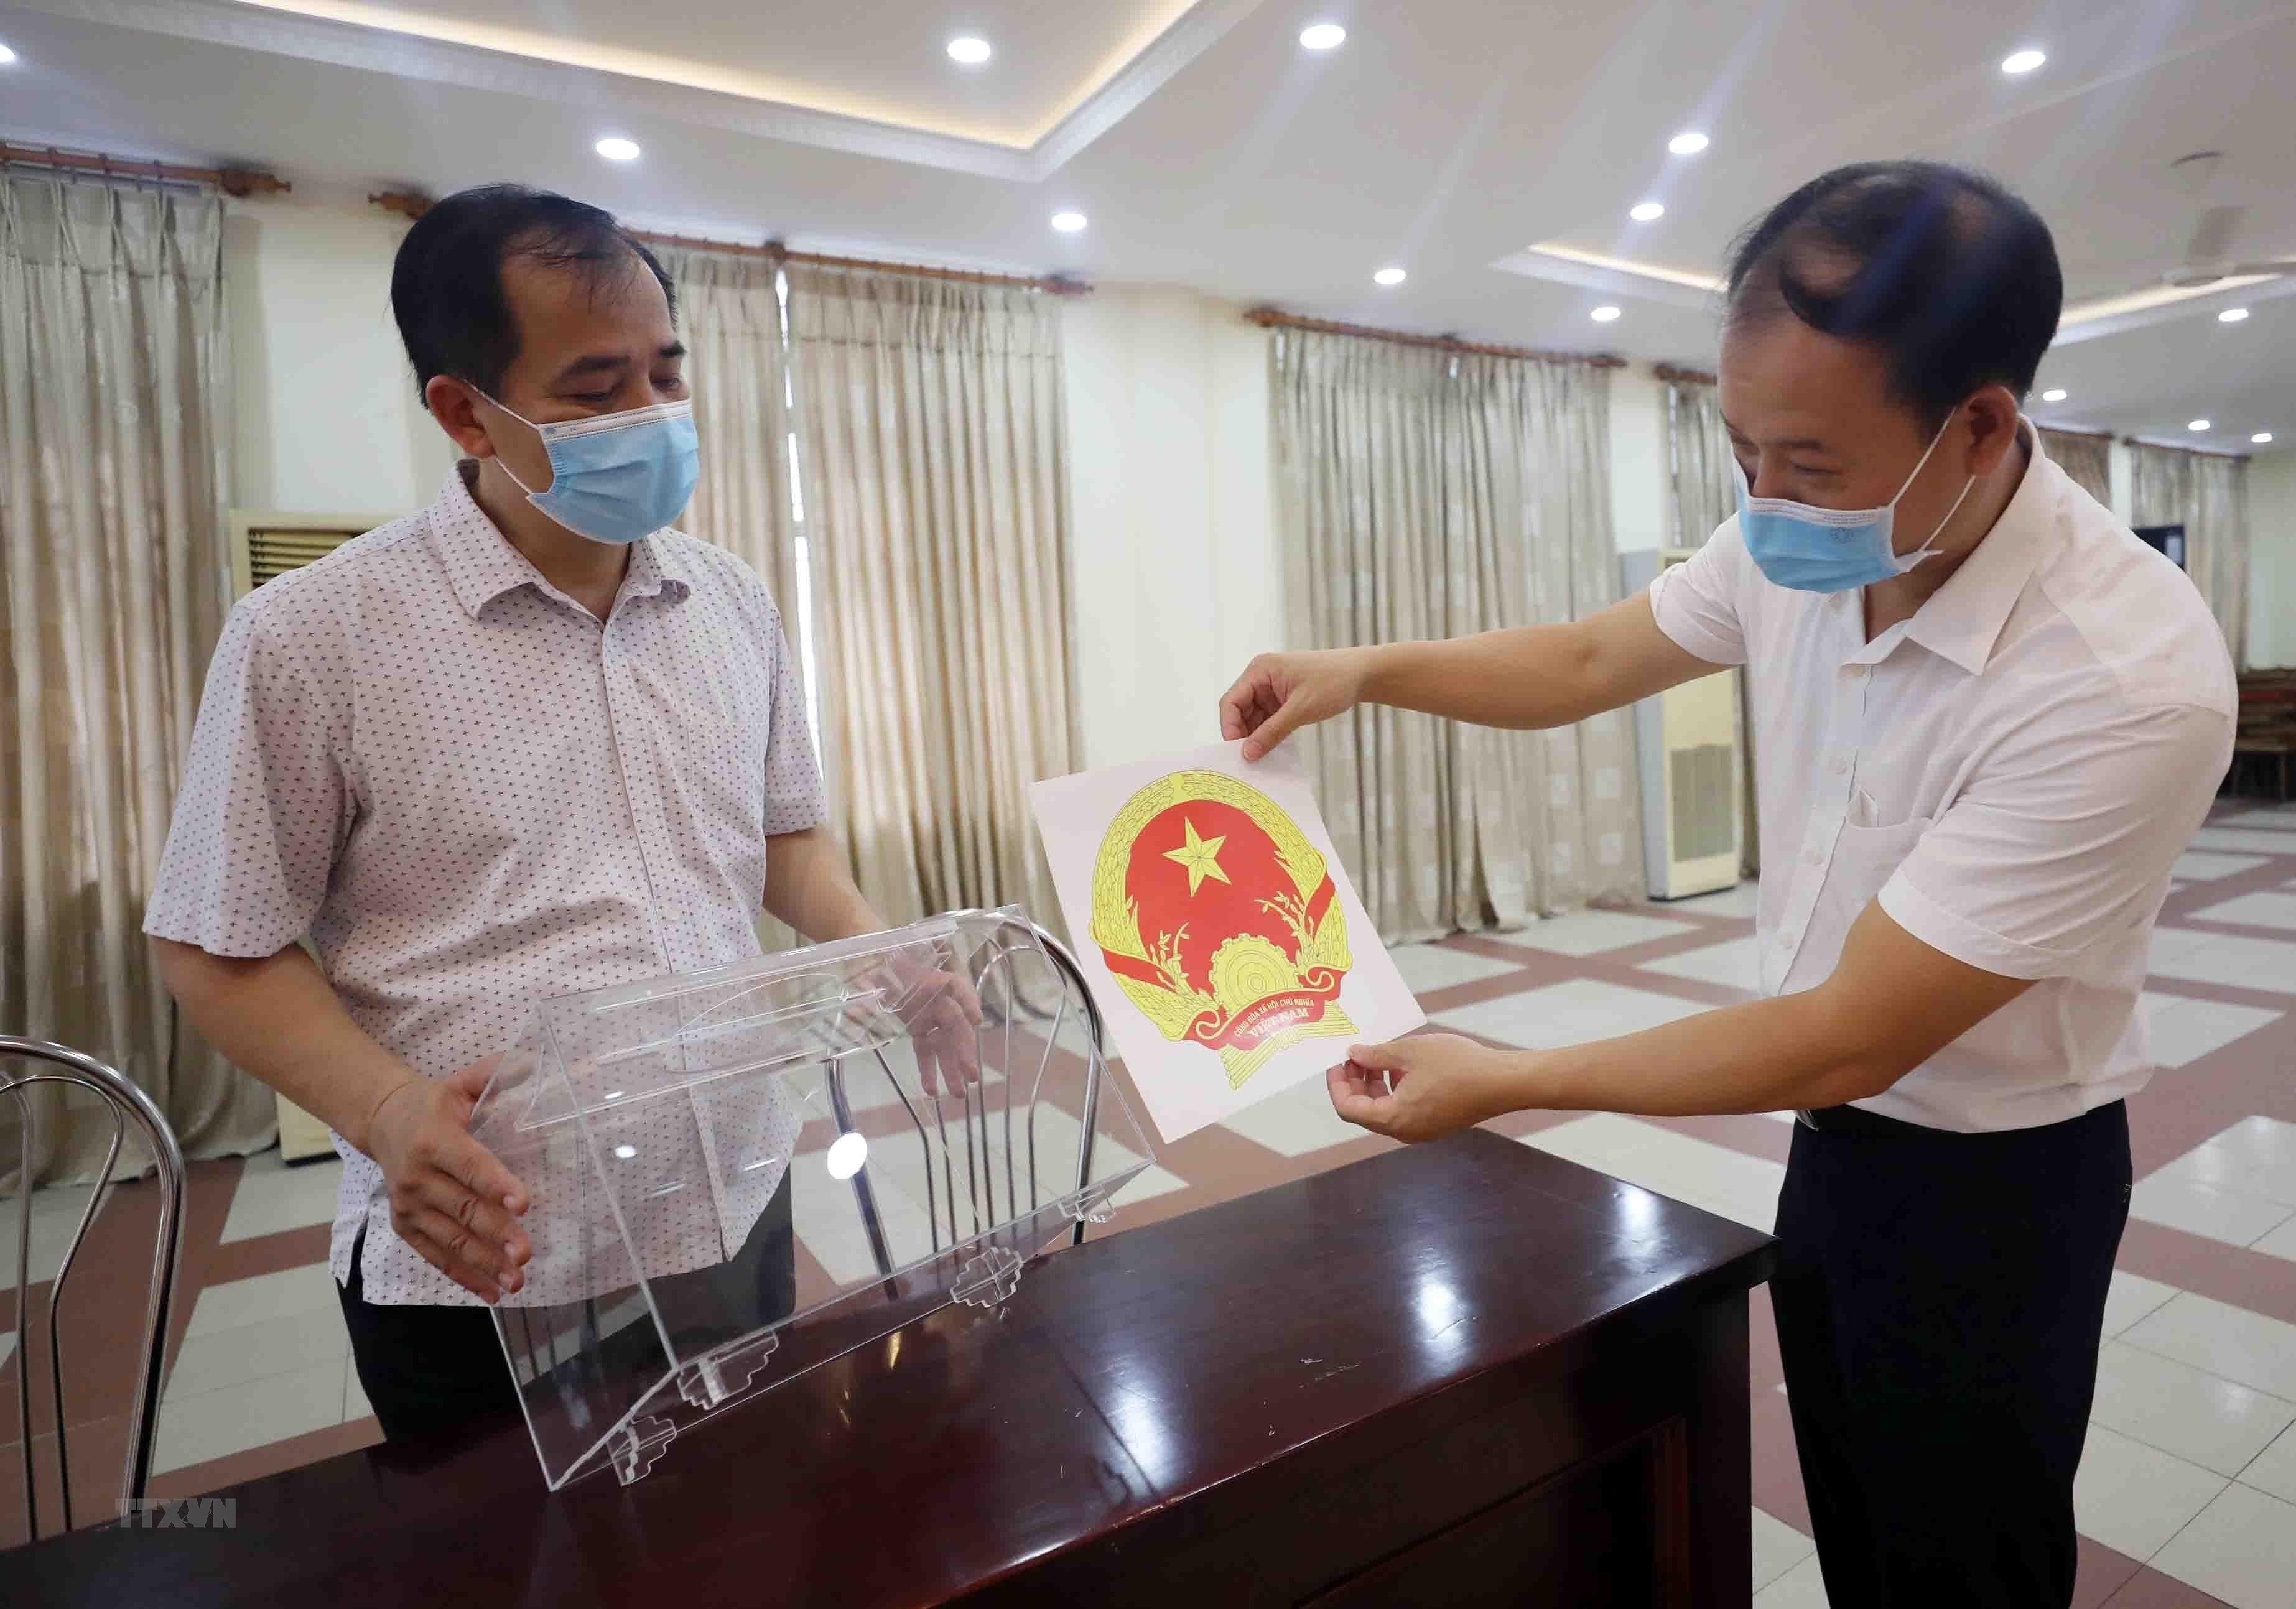 [Photo] Sinh vien noi tru tai Thu do no nuc truoc Ngay hoi bau cu hinh anh 5